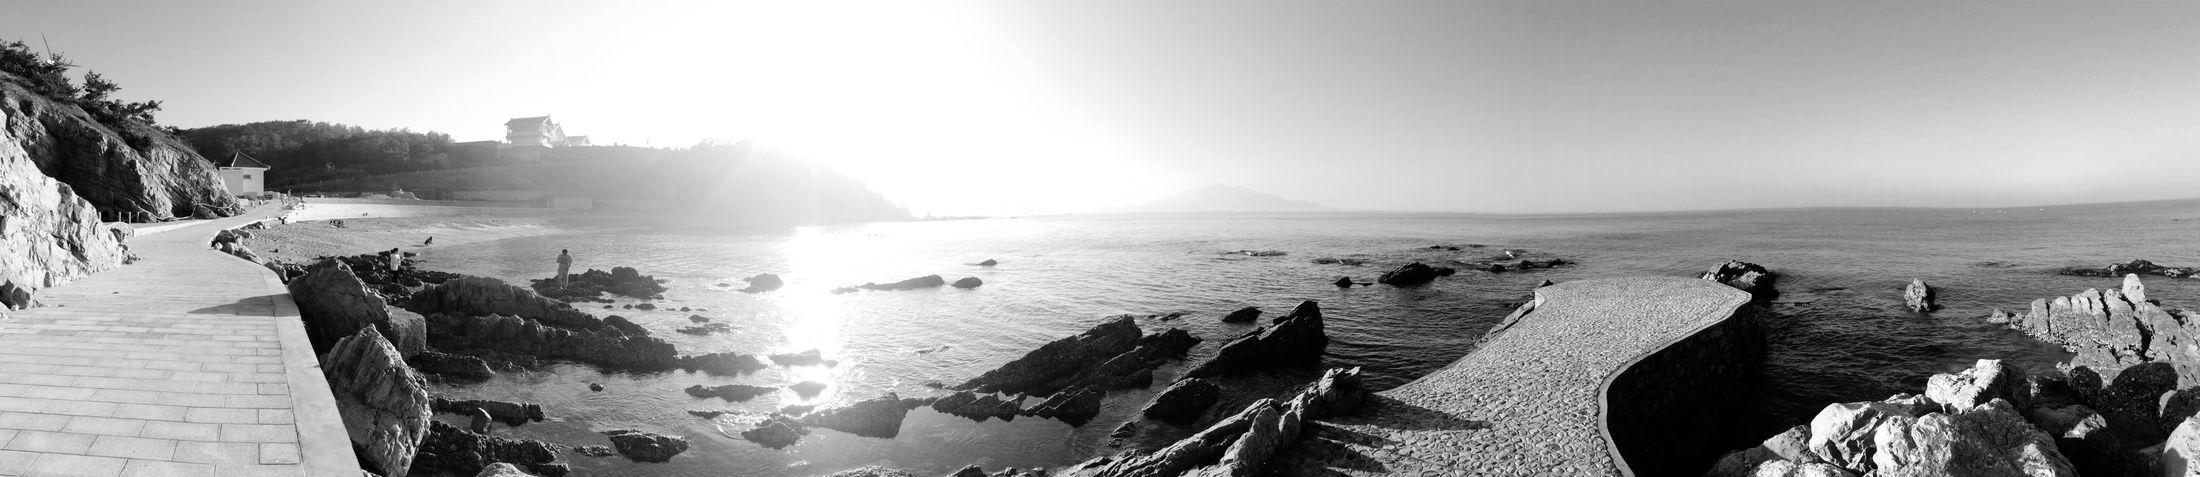 Underwater Photography 长岛 Asian Culture RobertEkbergTallberg Share Your Adventure Landscape Blackandwhite